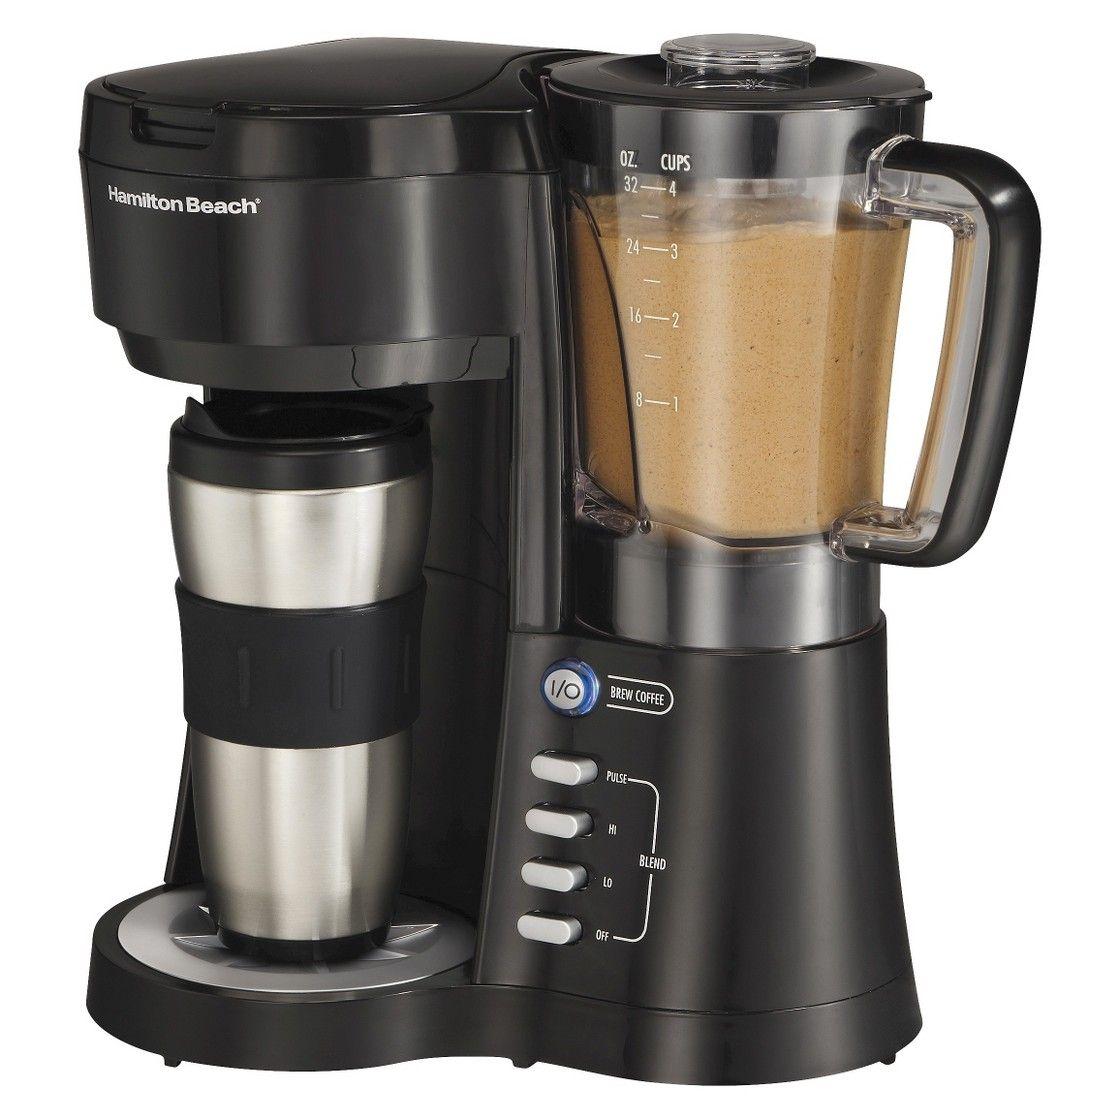 Hamilton Beach Java Blend Coffee Brewer/Blender | Blended ...